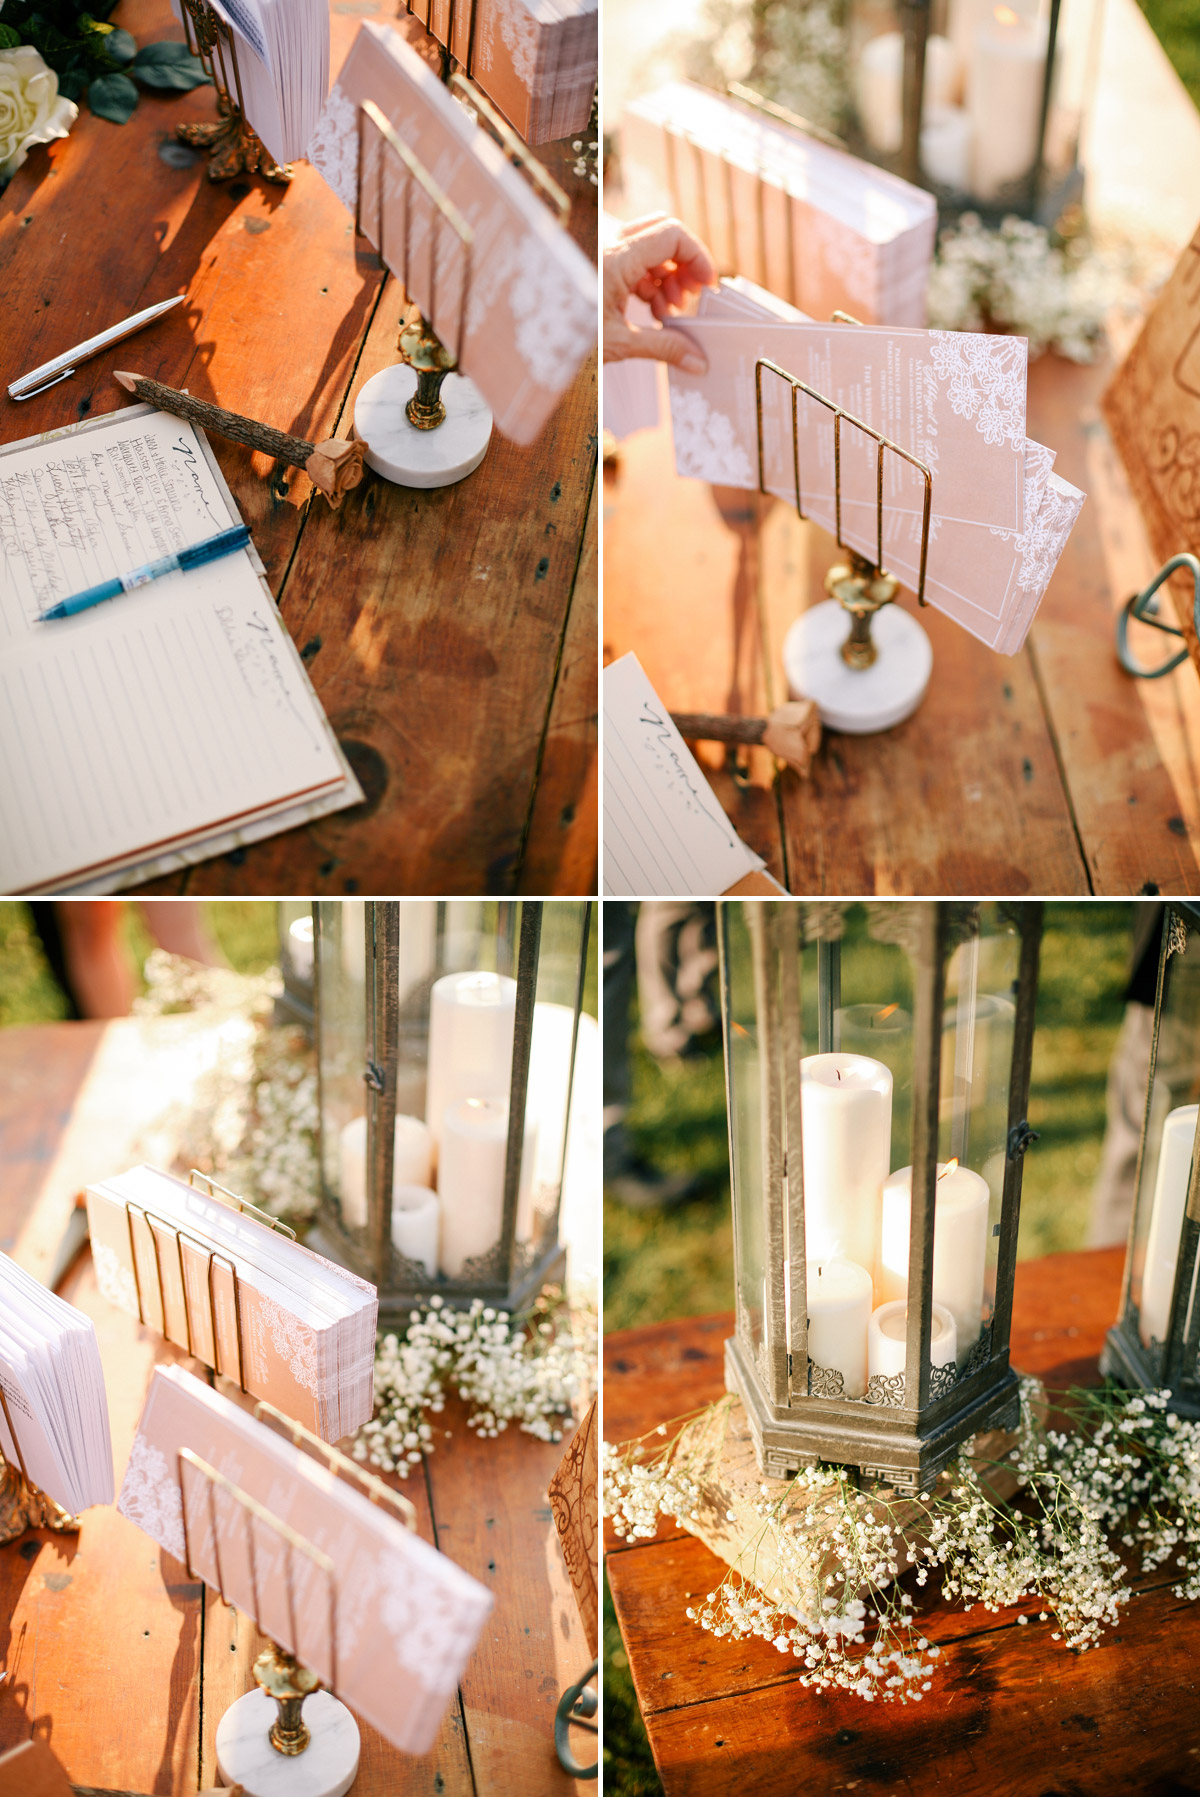 Blog-Collage-1401688391932.jpg